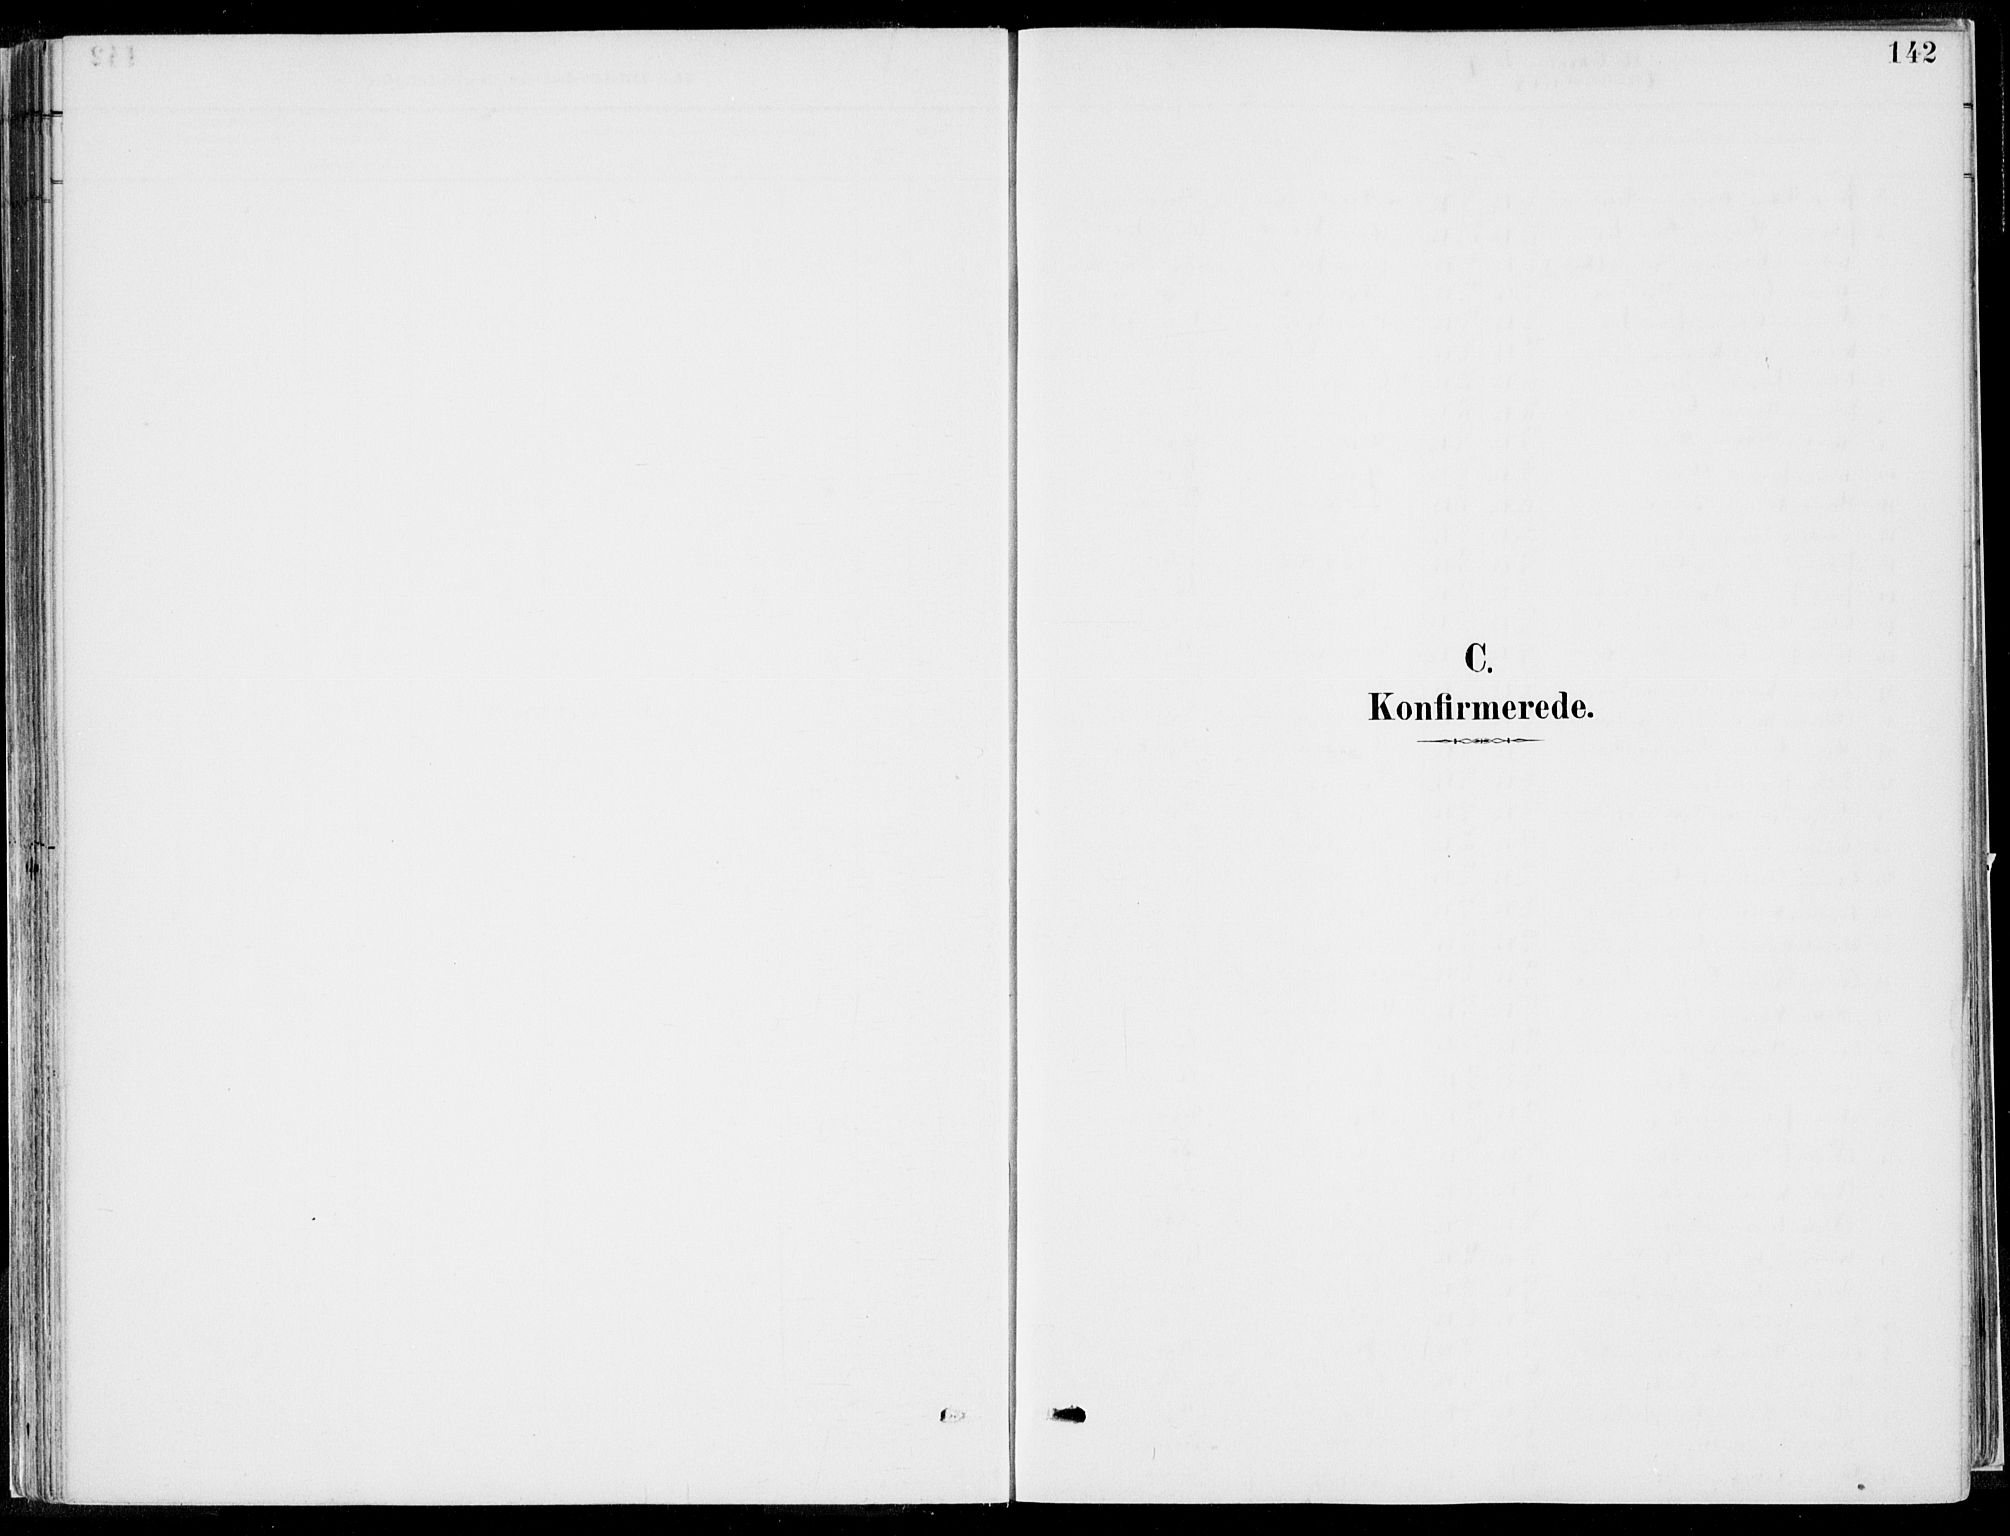 SAB, Kvinnherad Sokneprestembete, H/Haa: Ministerialbok nr. B  1, 1887-1921, s. 142